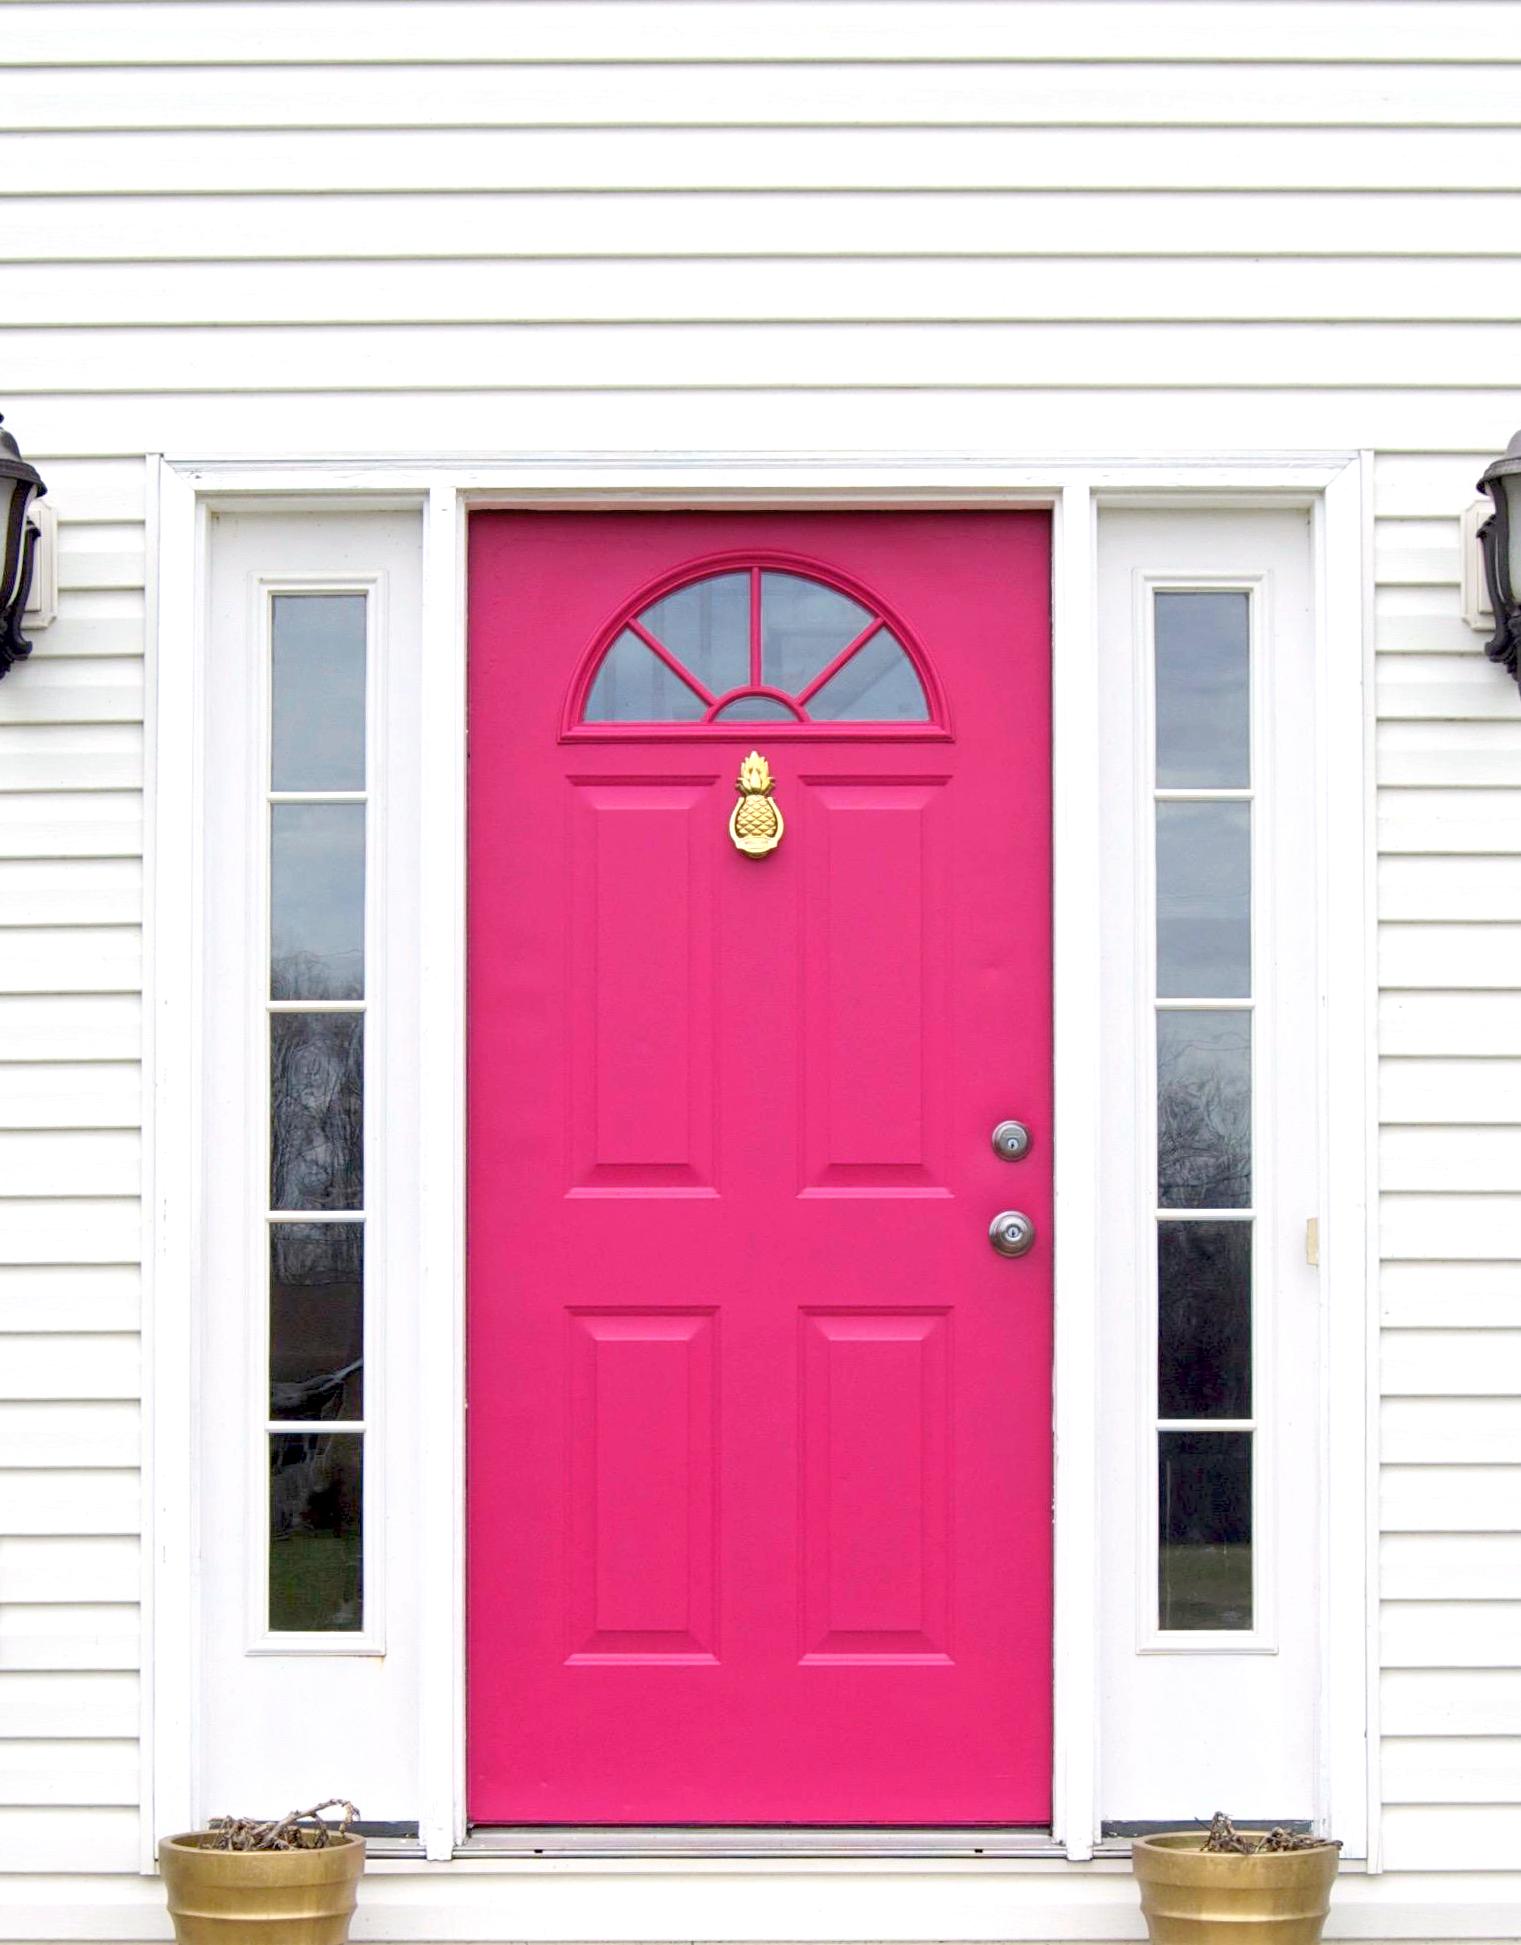 The Pink Door at Erica Hammer Calligraphy and Creative Studio